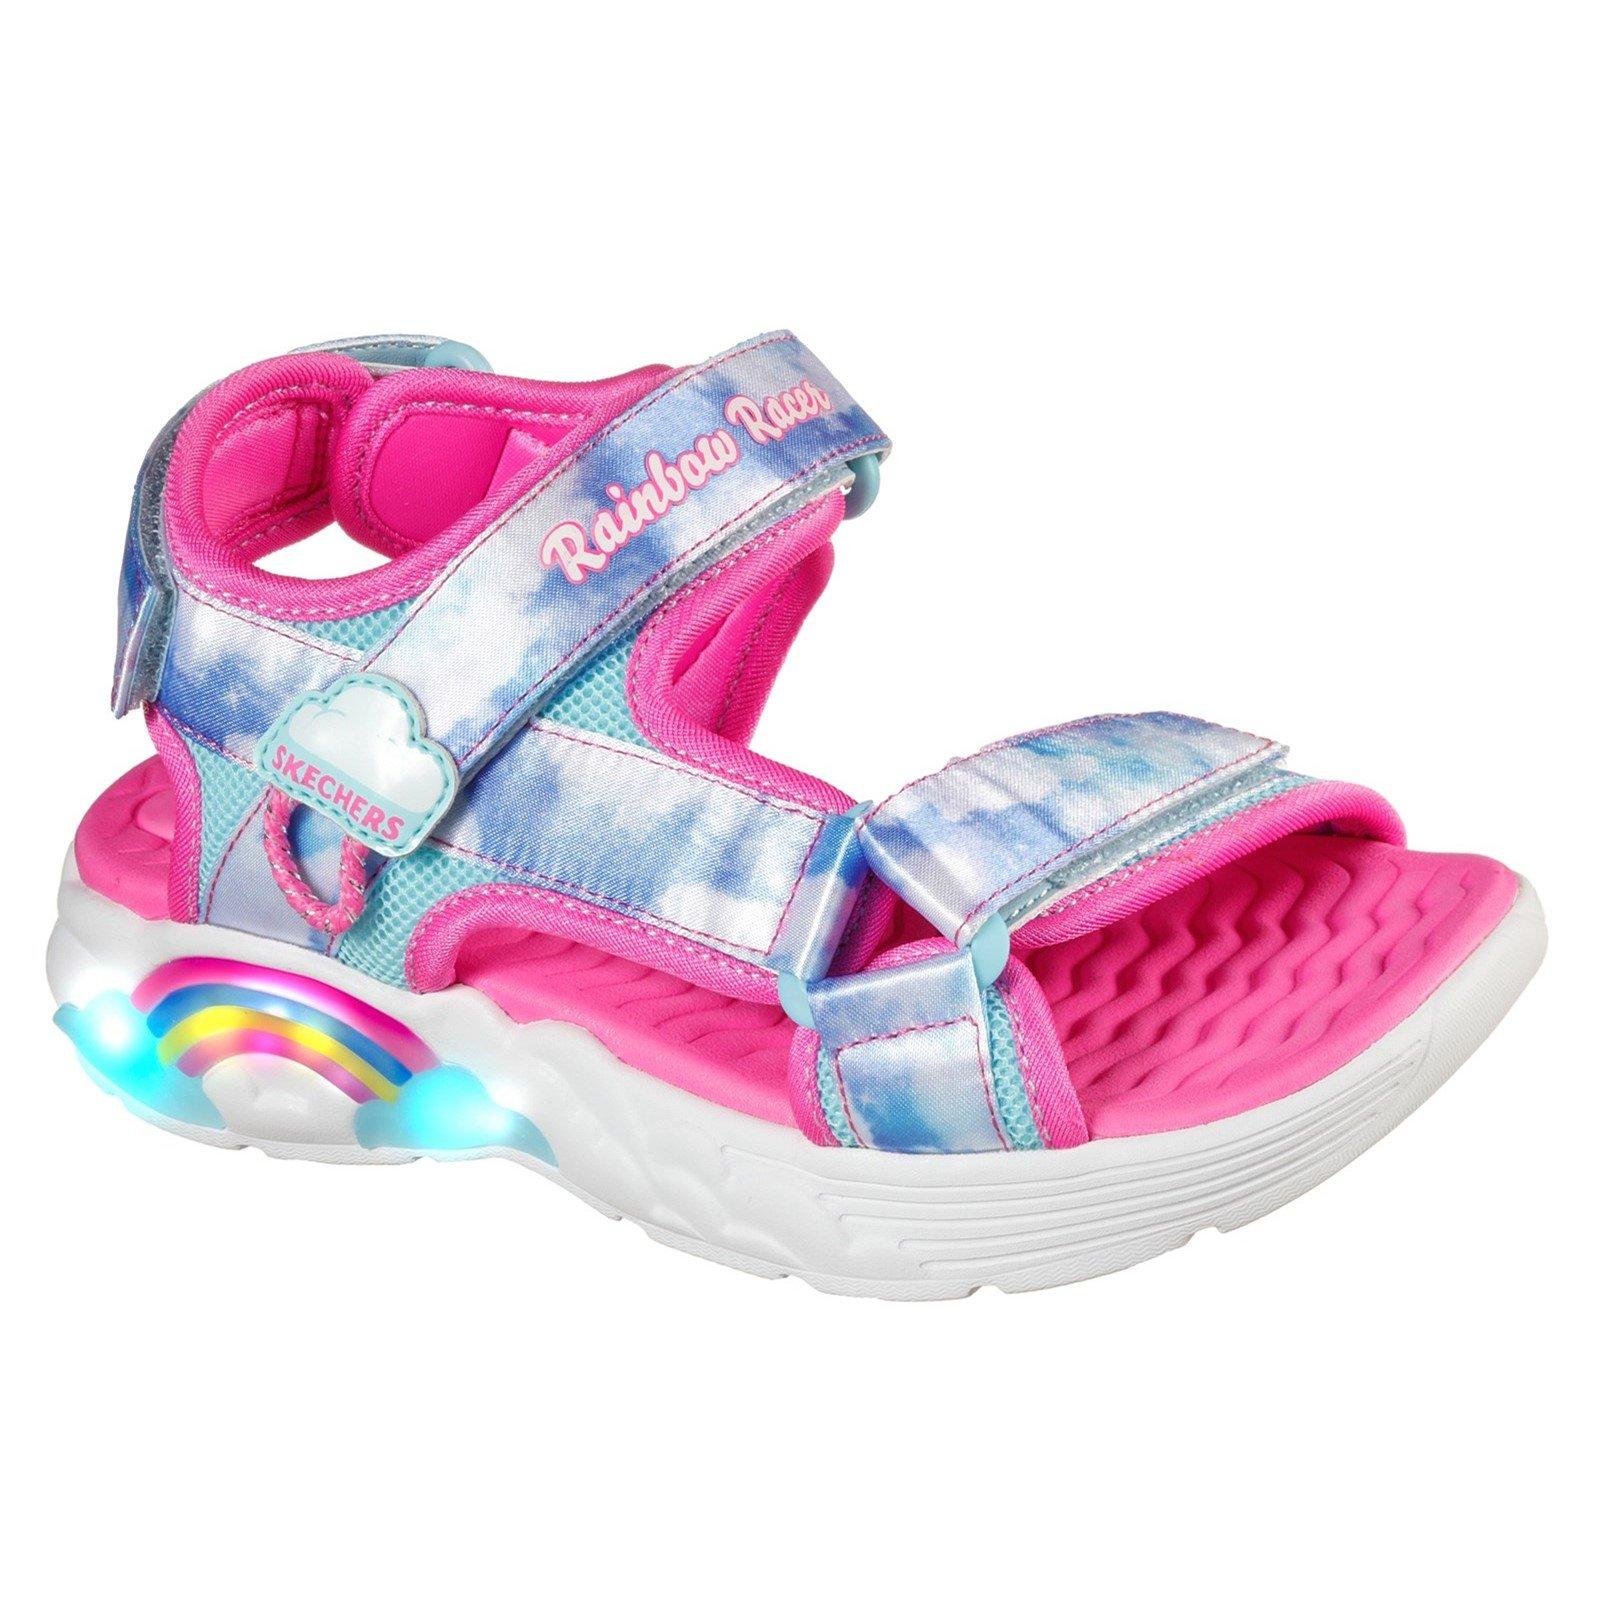 Skechers Unisex Rainbow Racer Summer Sky Beach Sandals Multicolor 32096 - Pink/Blue Textile 1.5